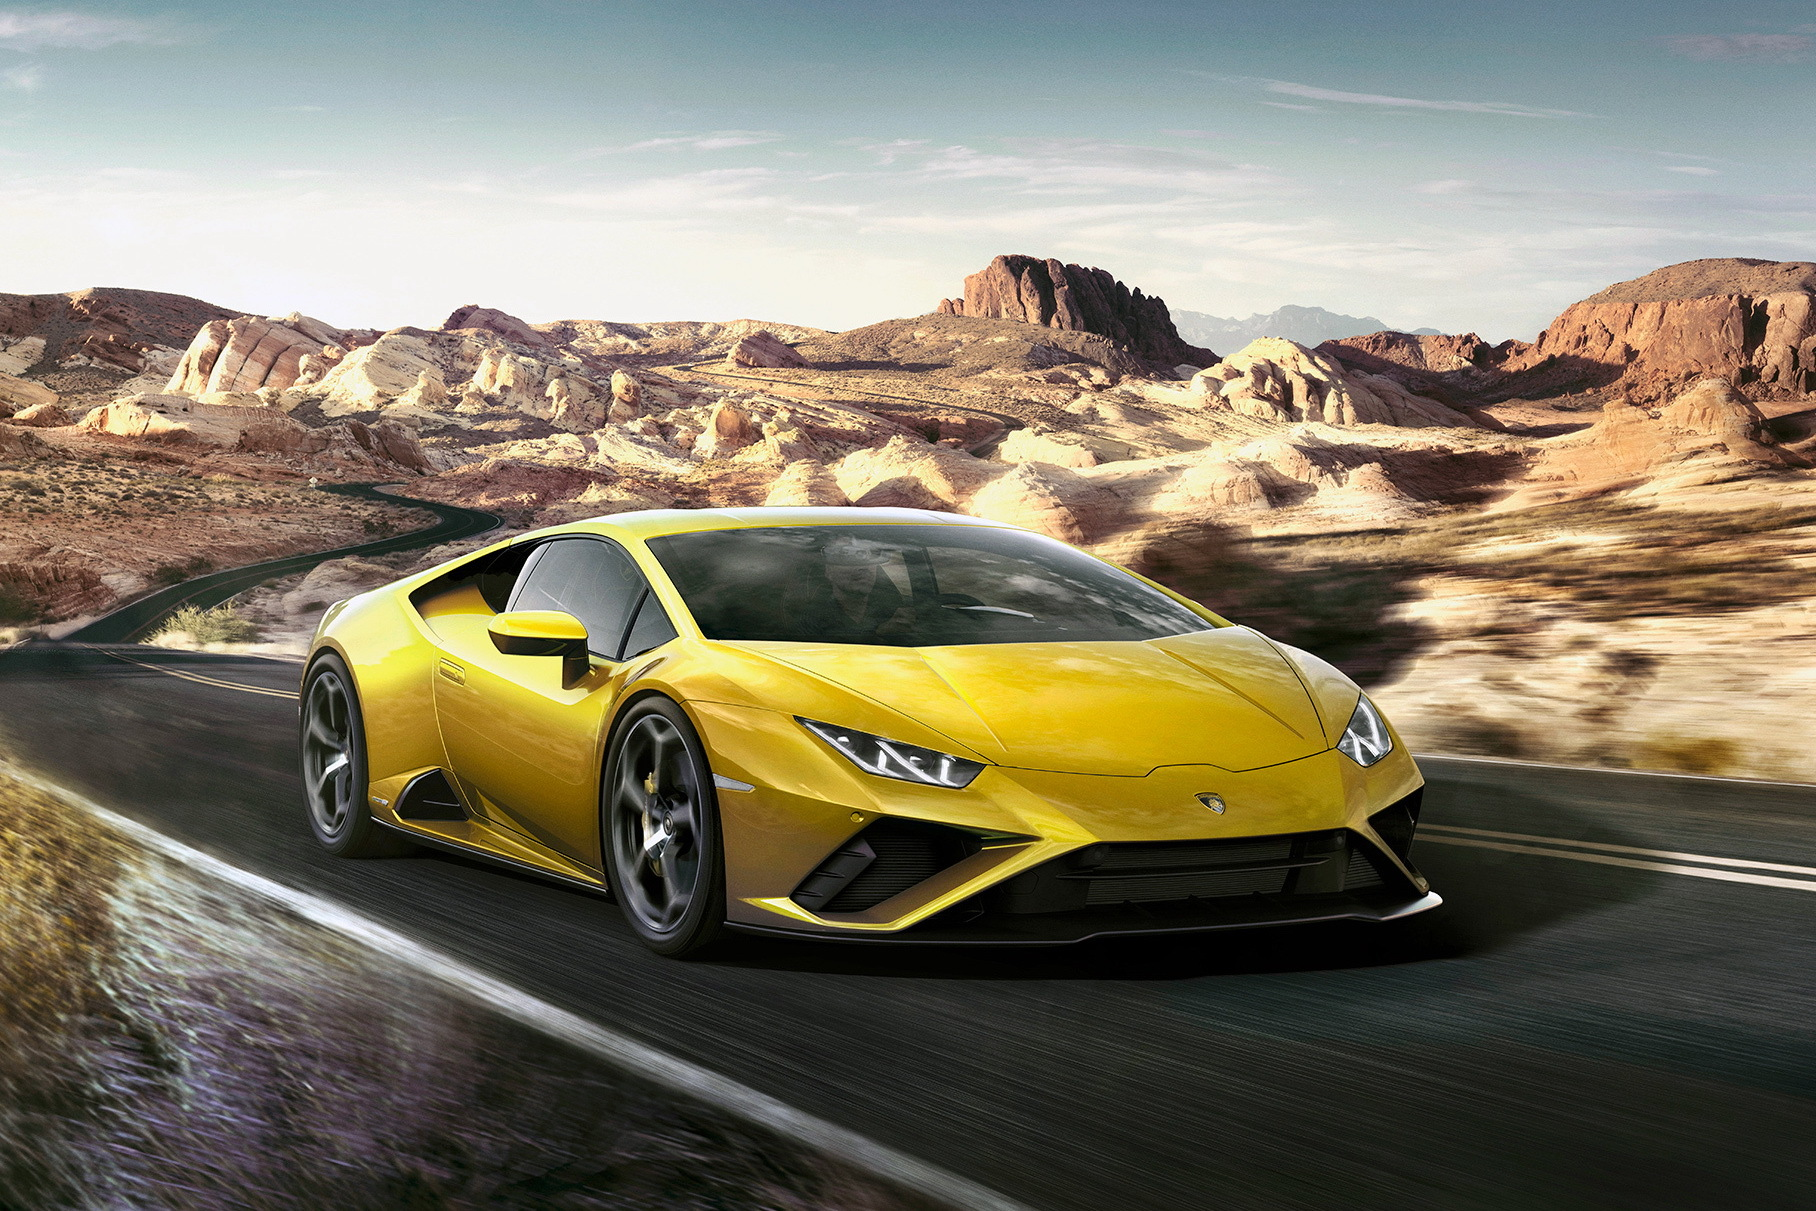 Lamborghini huracan lp 610-4: цена, фото